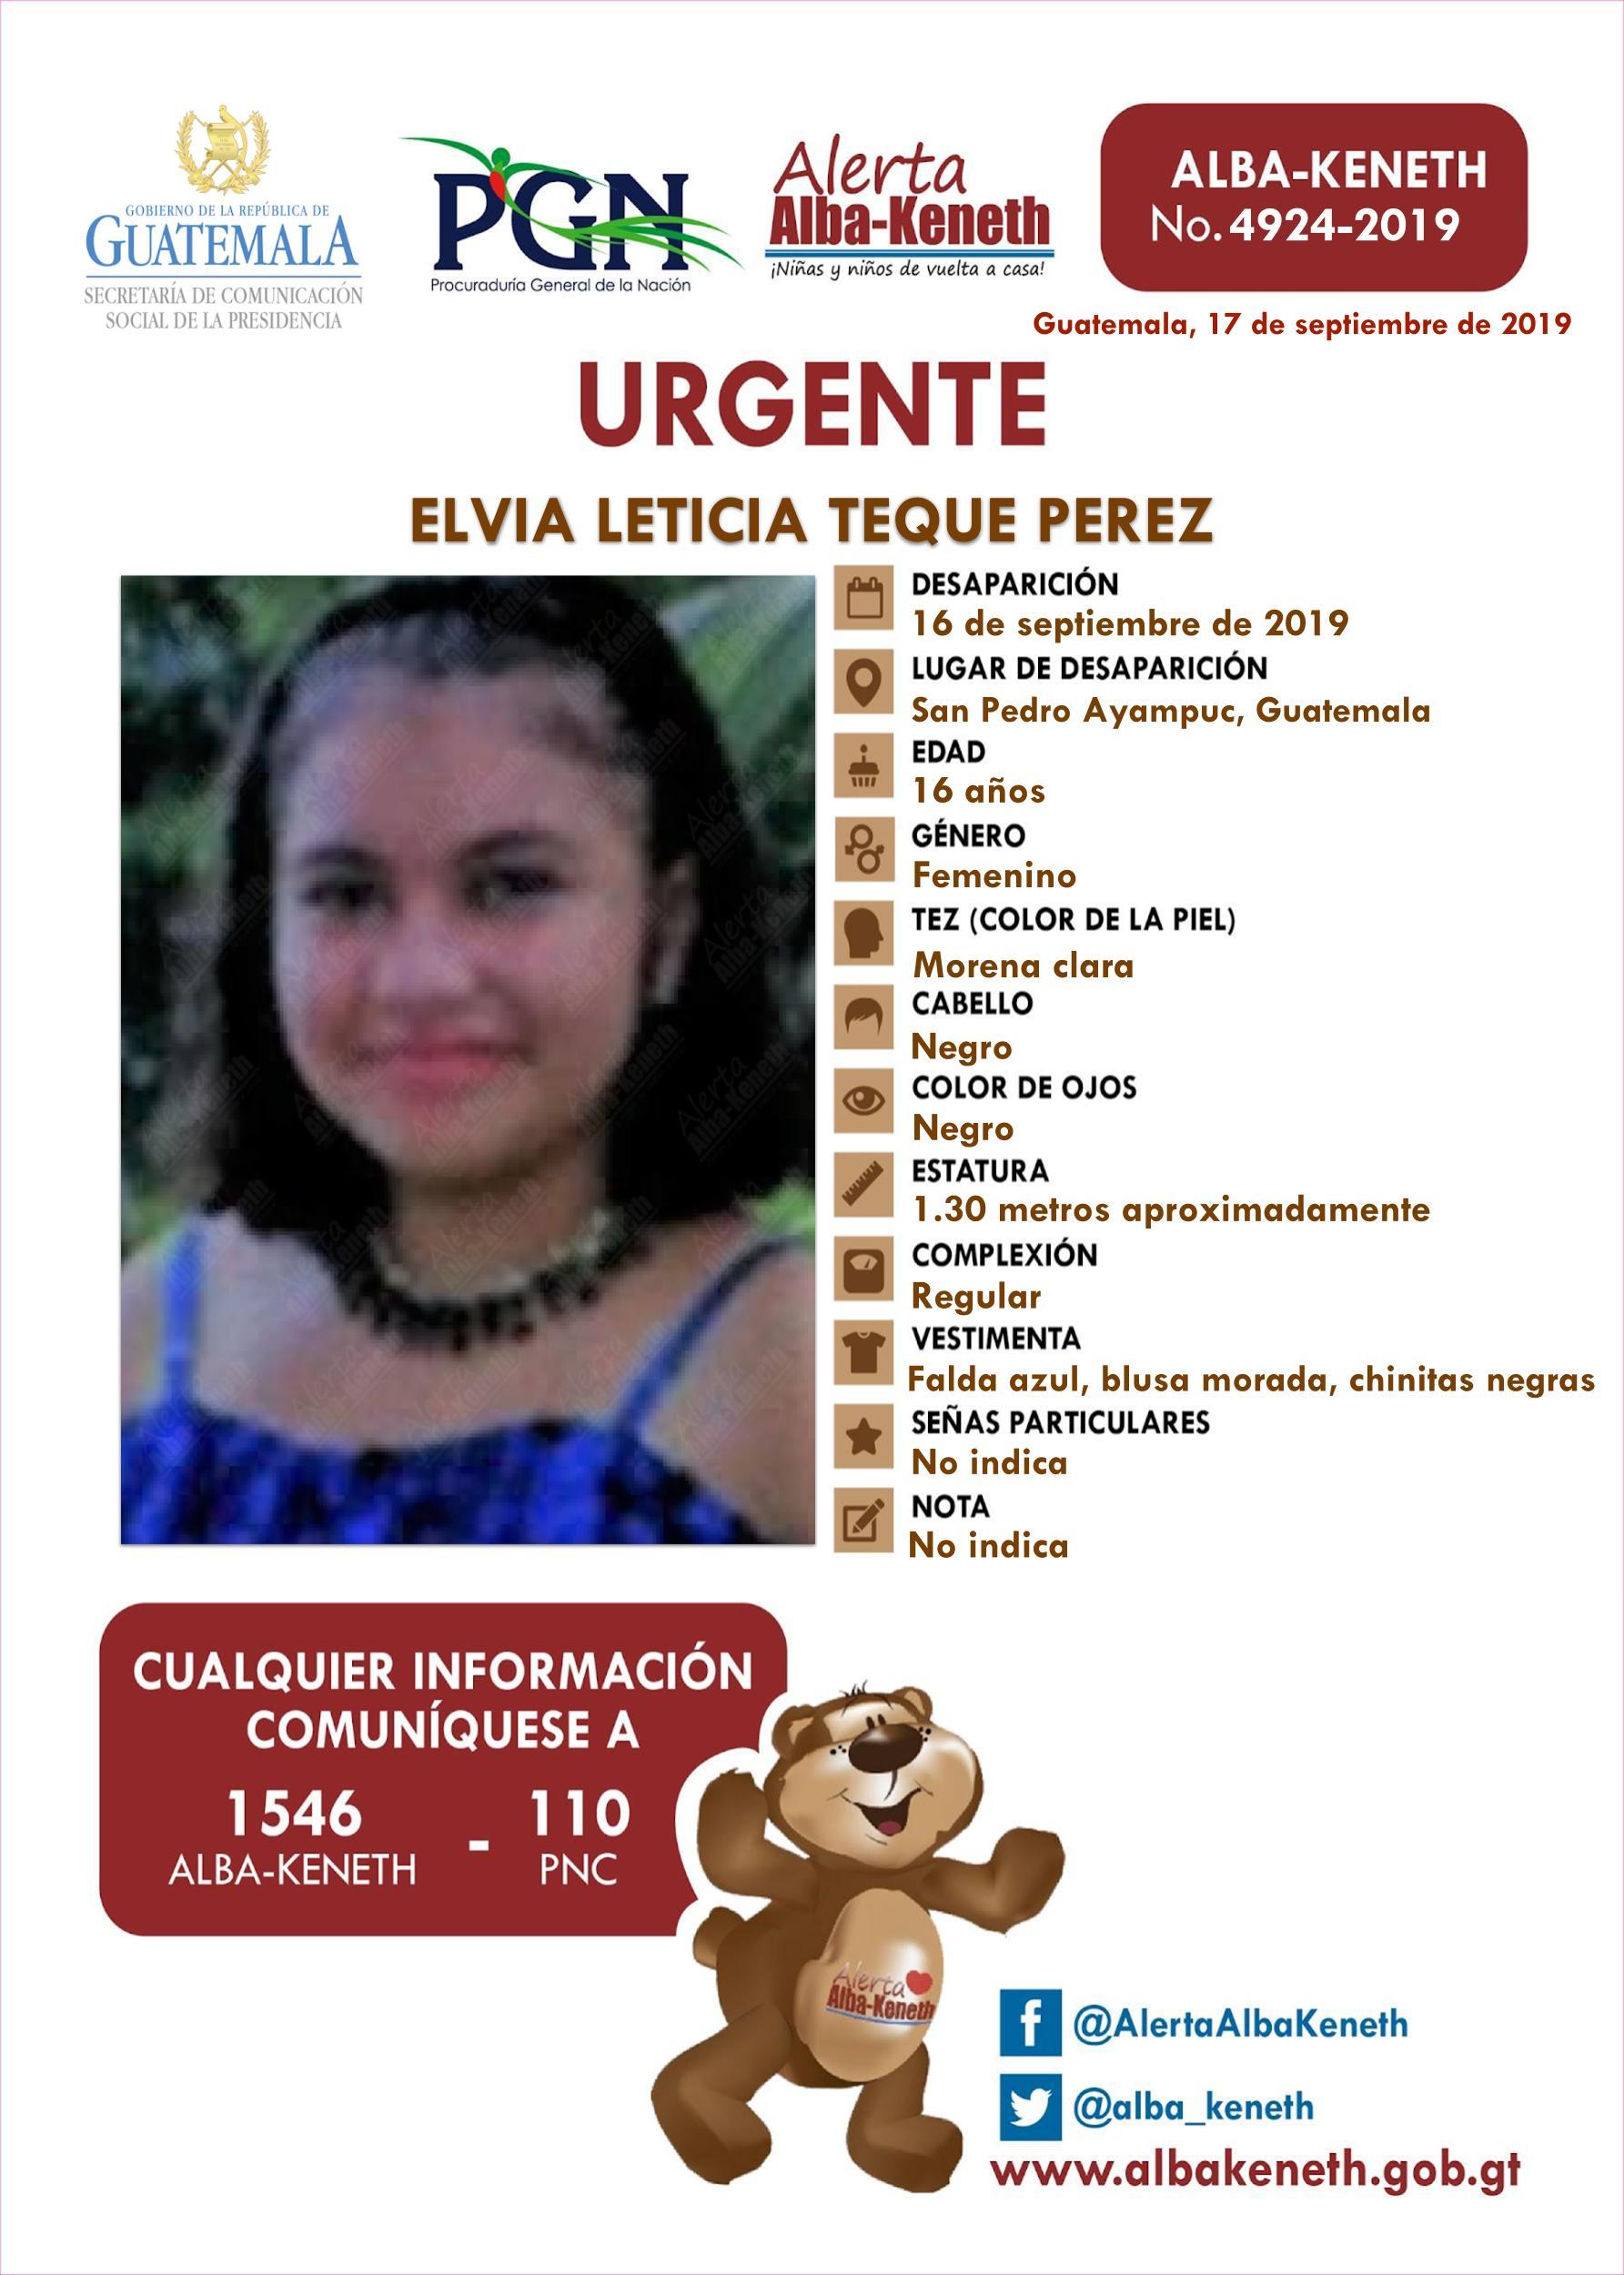 Elvia Leticia Teque Perez